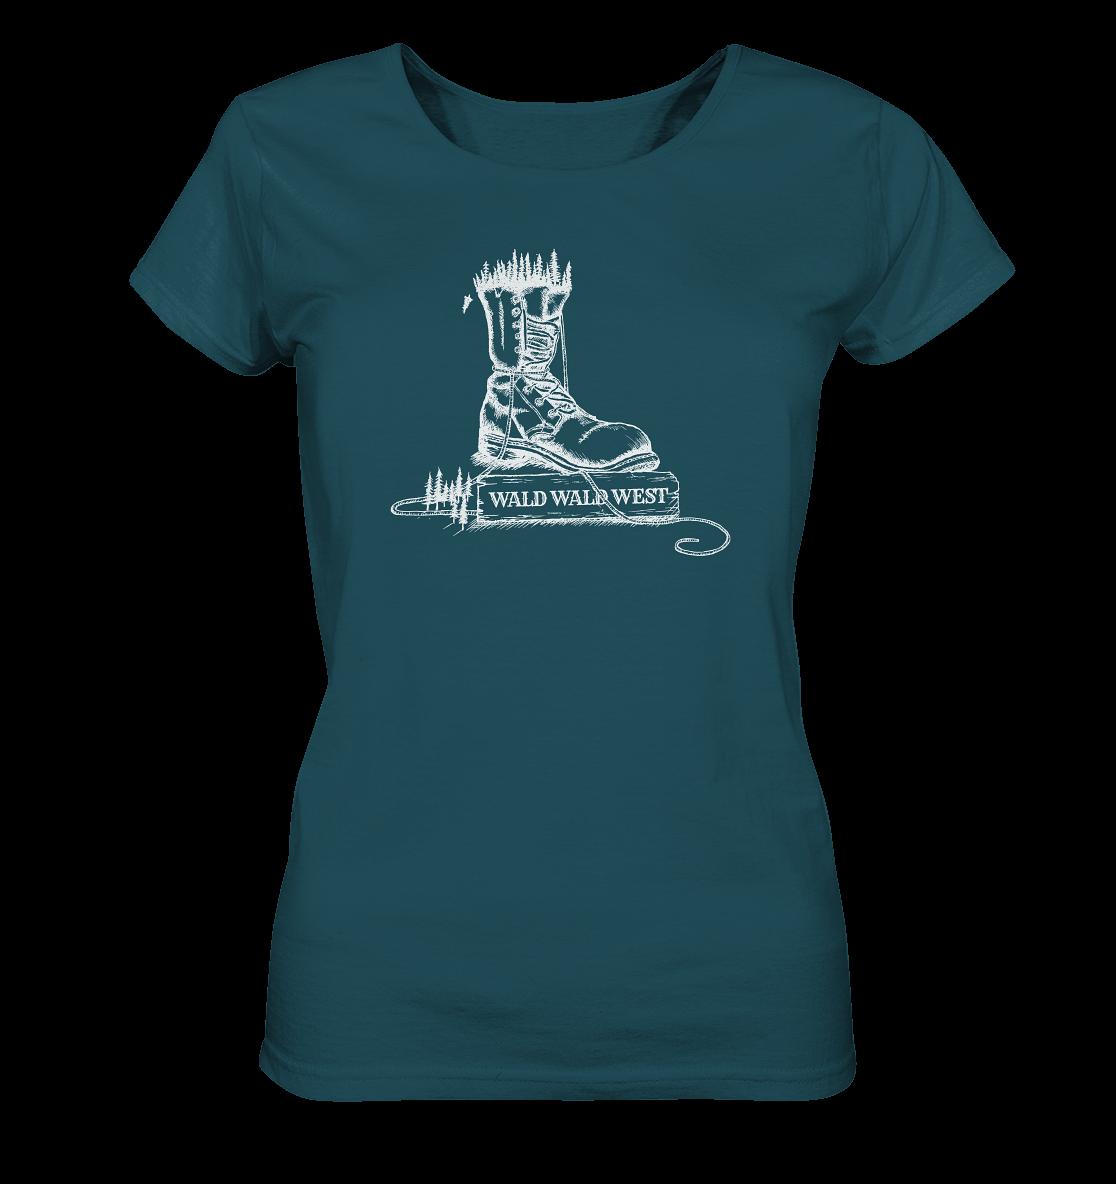 front-ladies-organic-shirt-204d59-1116x.png